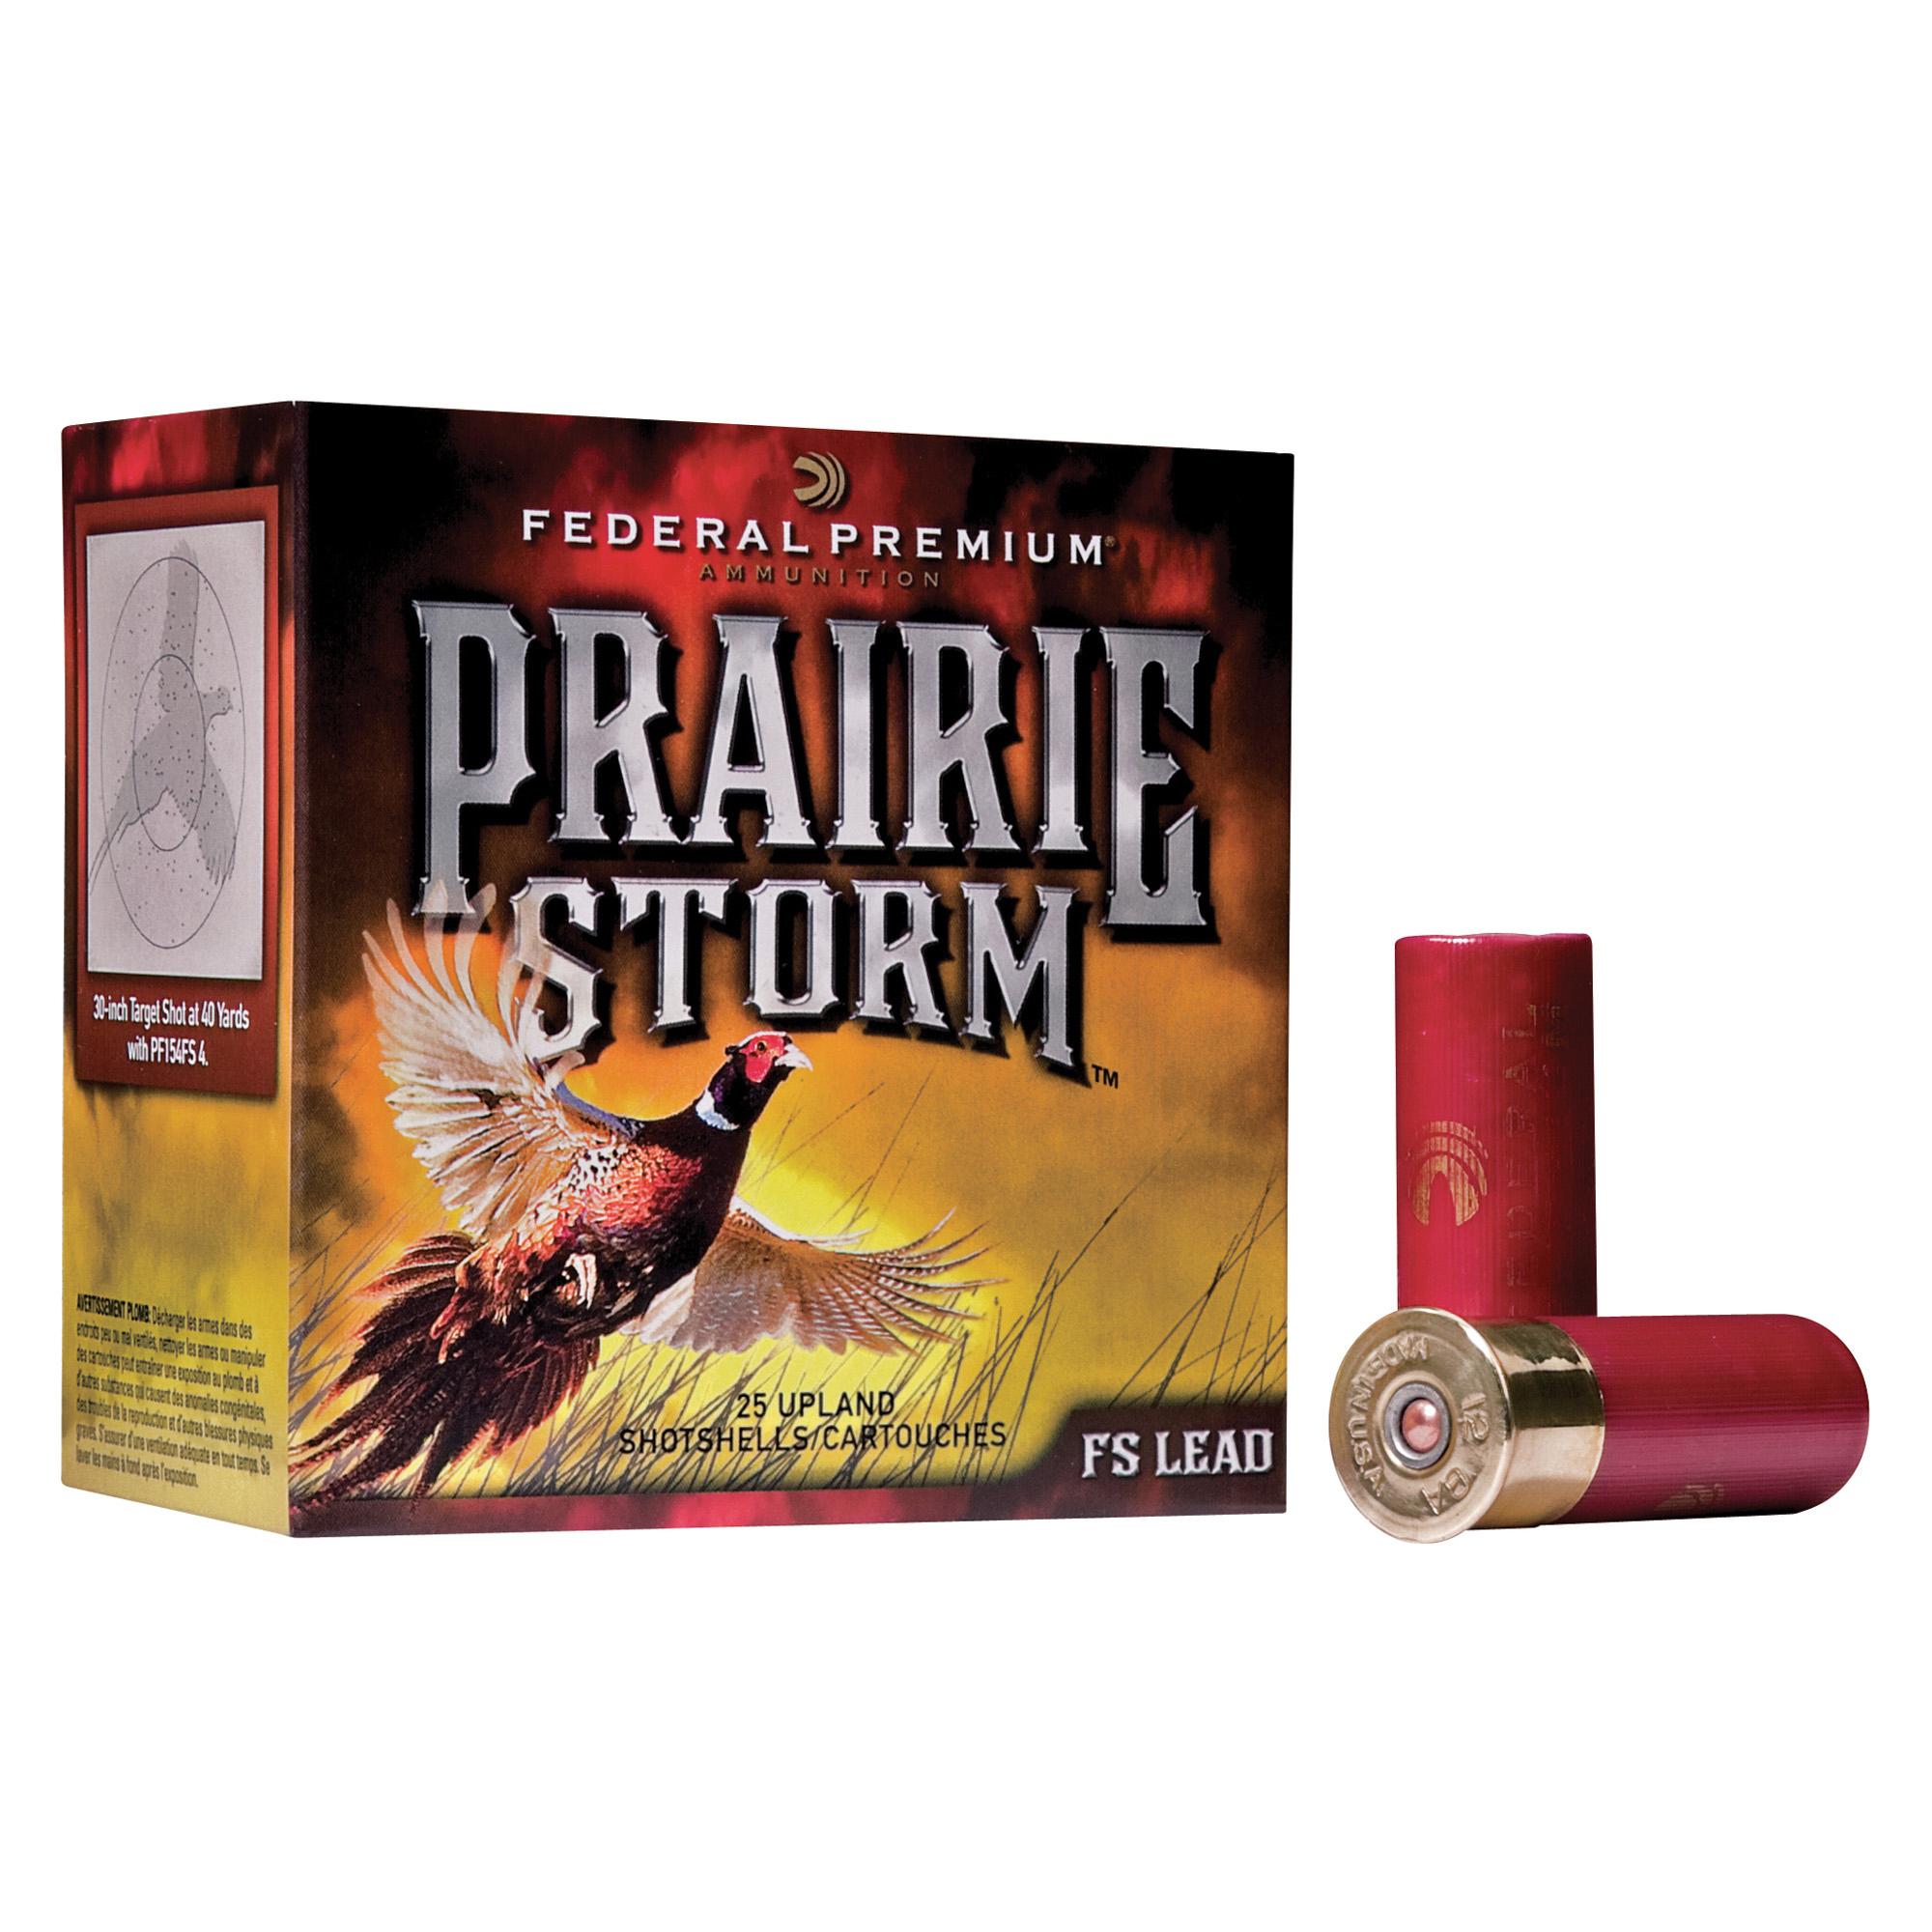 Federal Premium Prairie Storm Ammo, 12-ga, 2-3/4″, 1-1/4 oz.